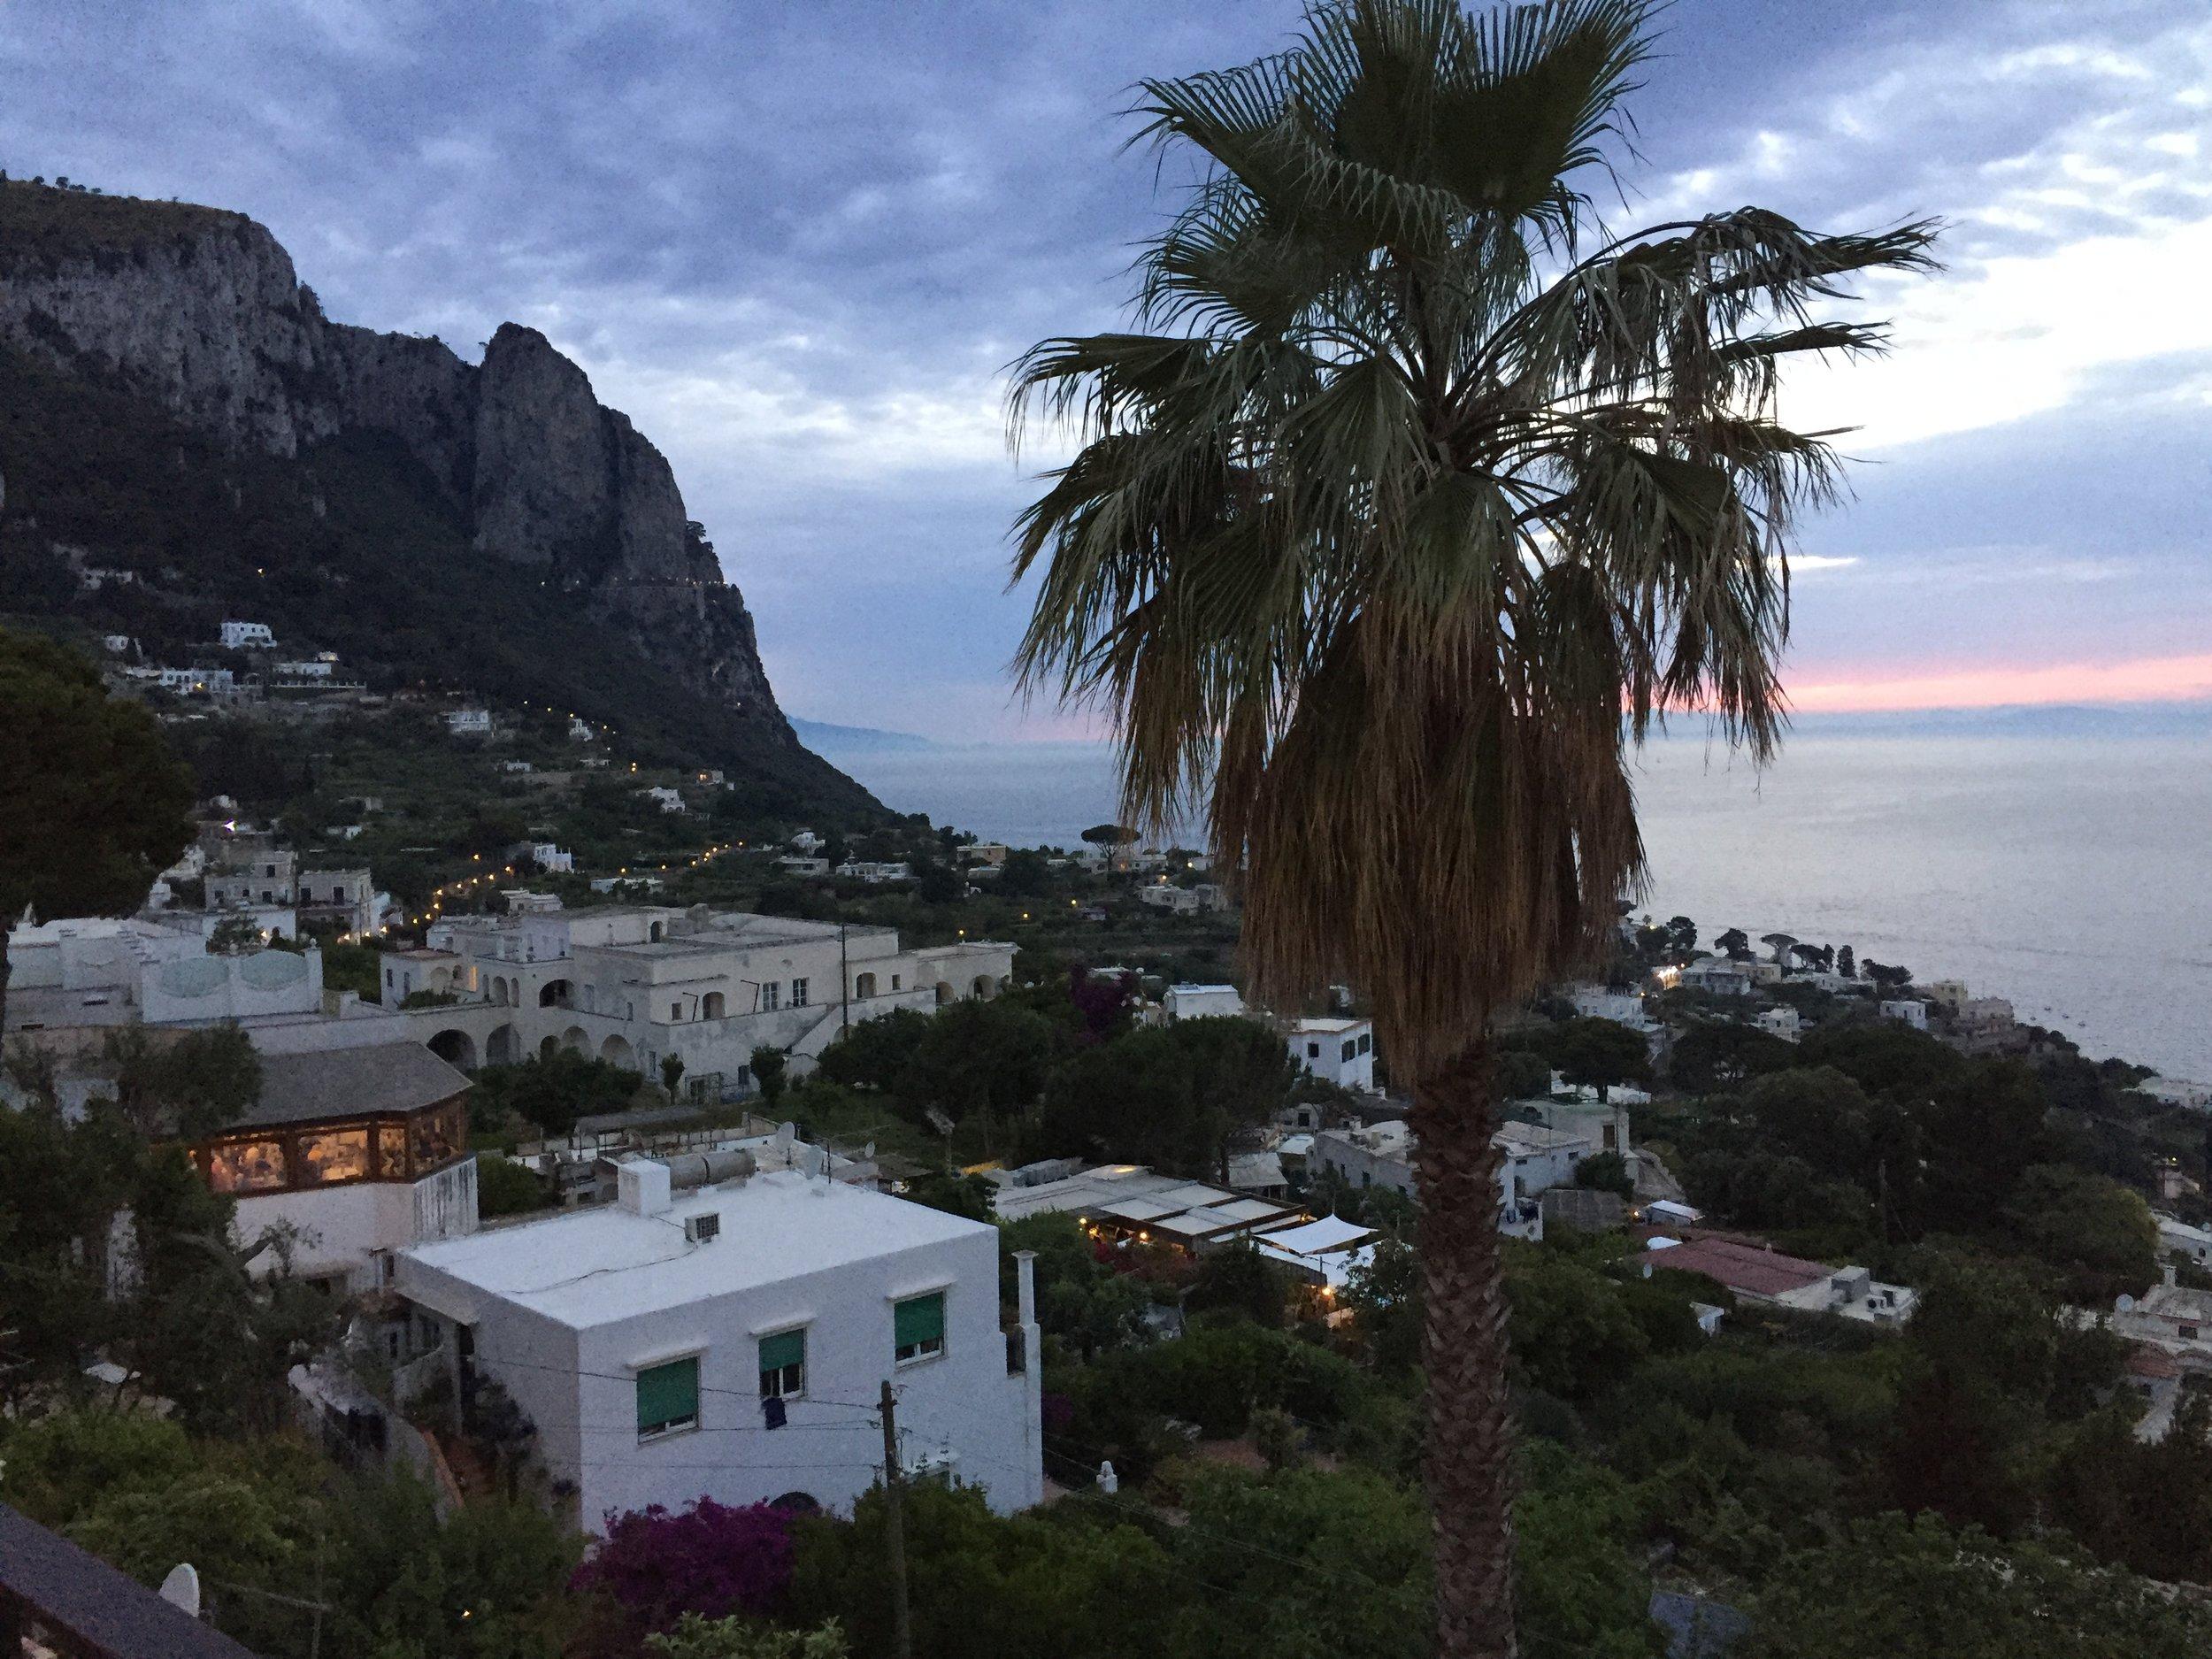 Evening View of Capri, Italy